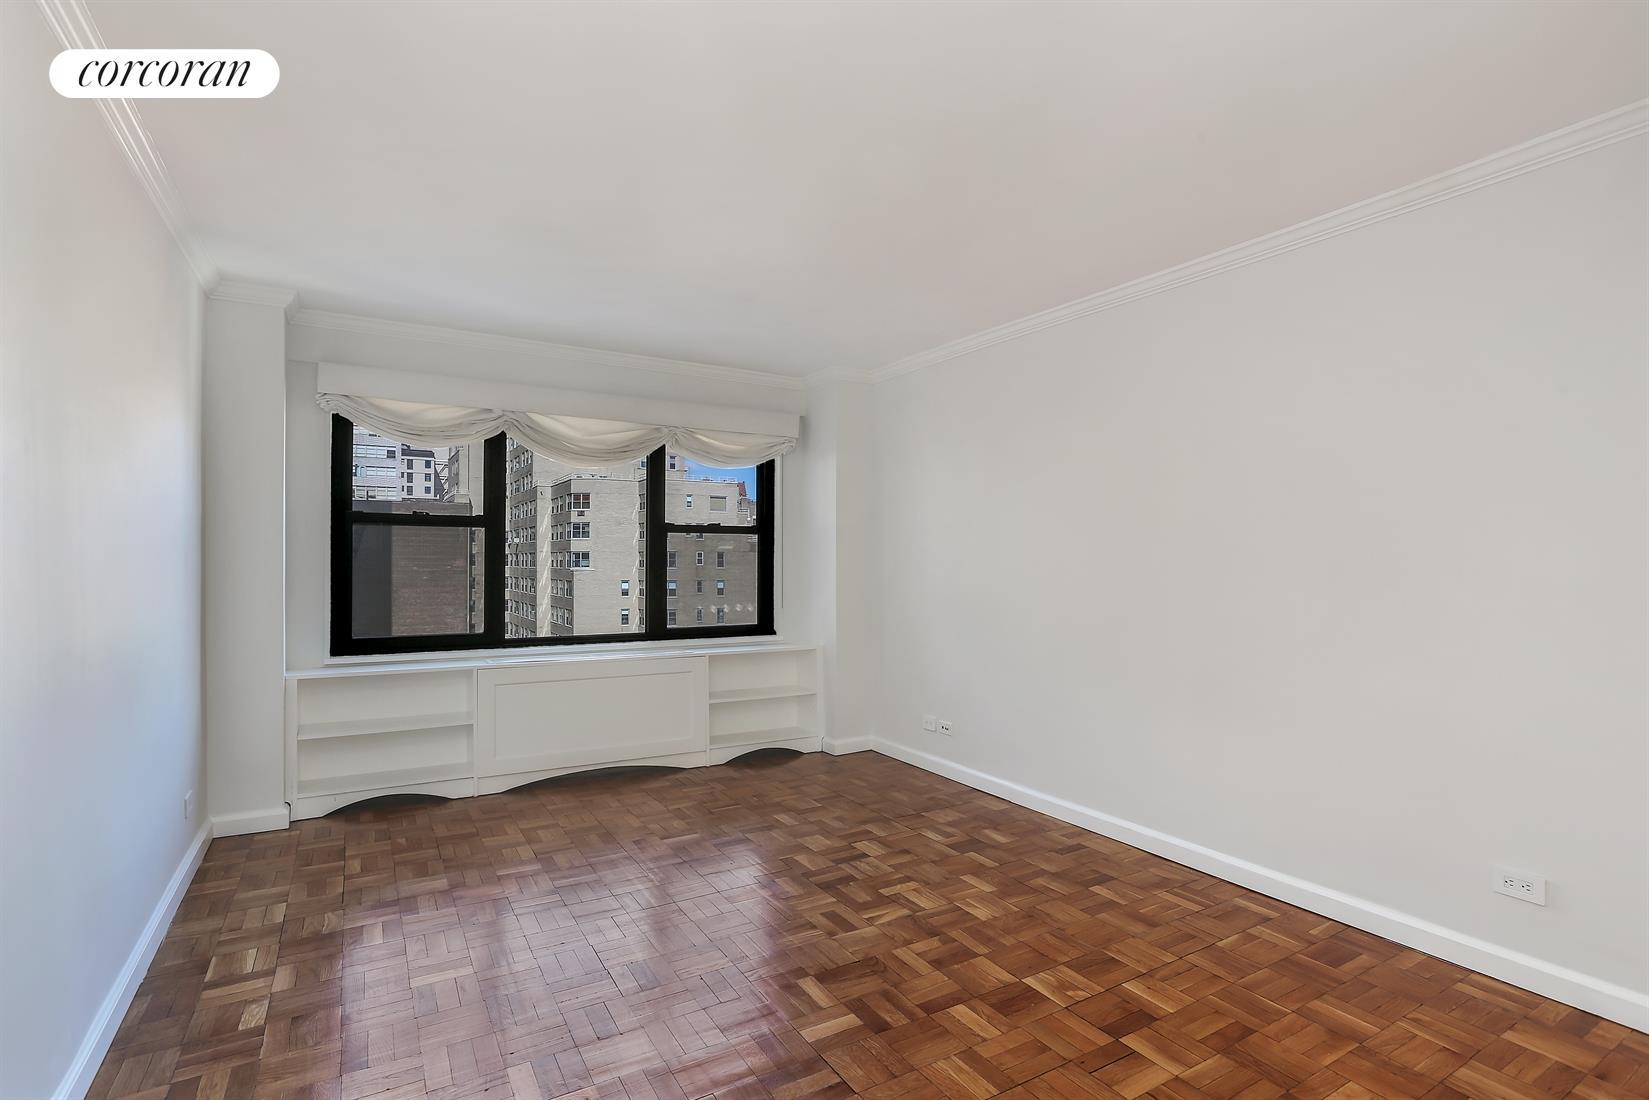 Corcoran 166 East 61st Street Apt 10f Upper East Side